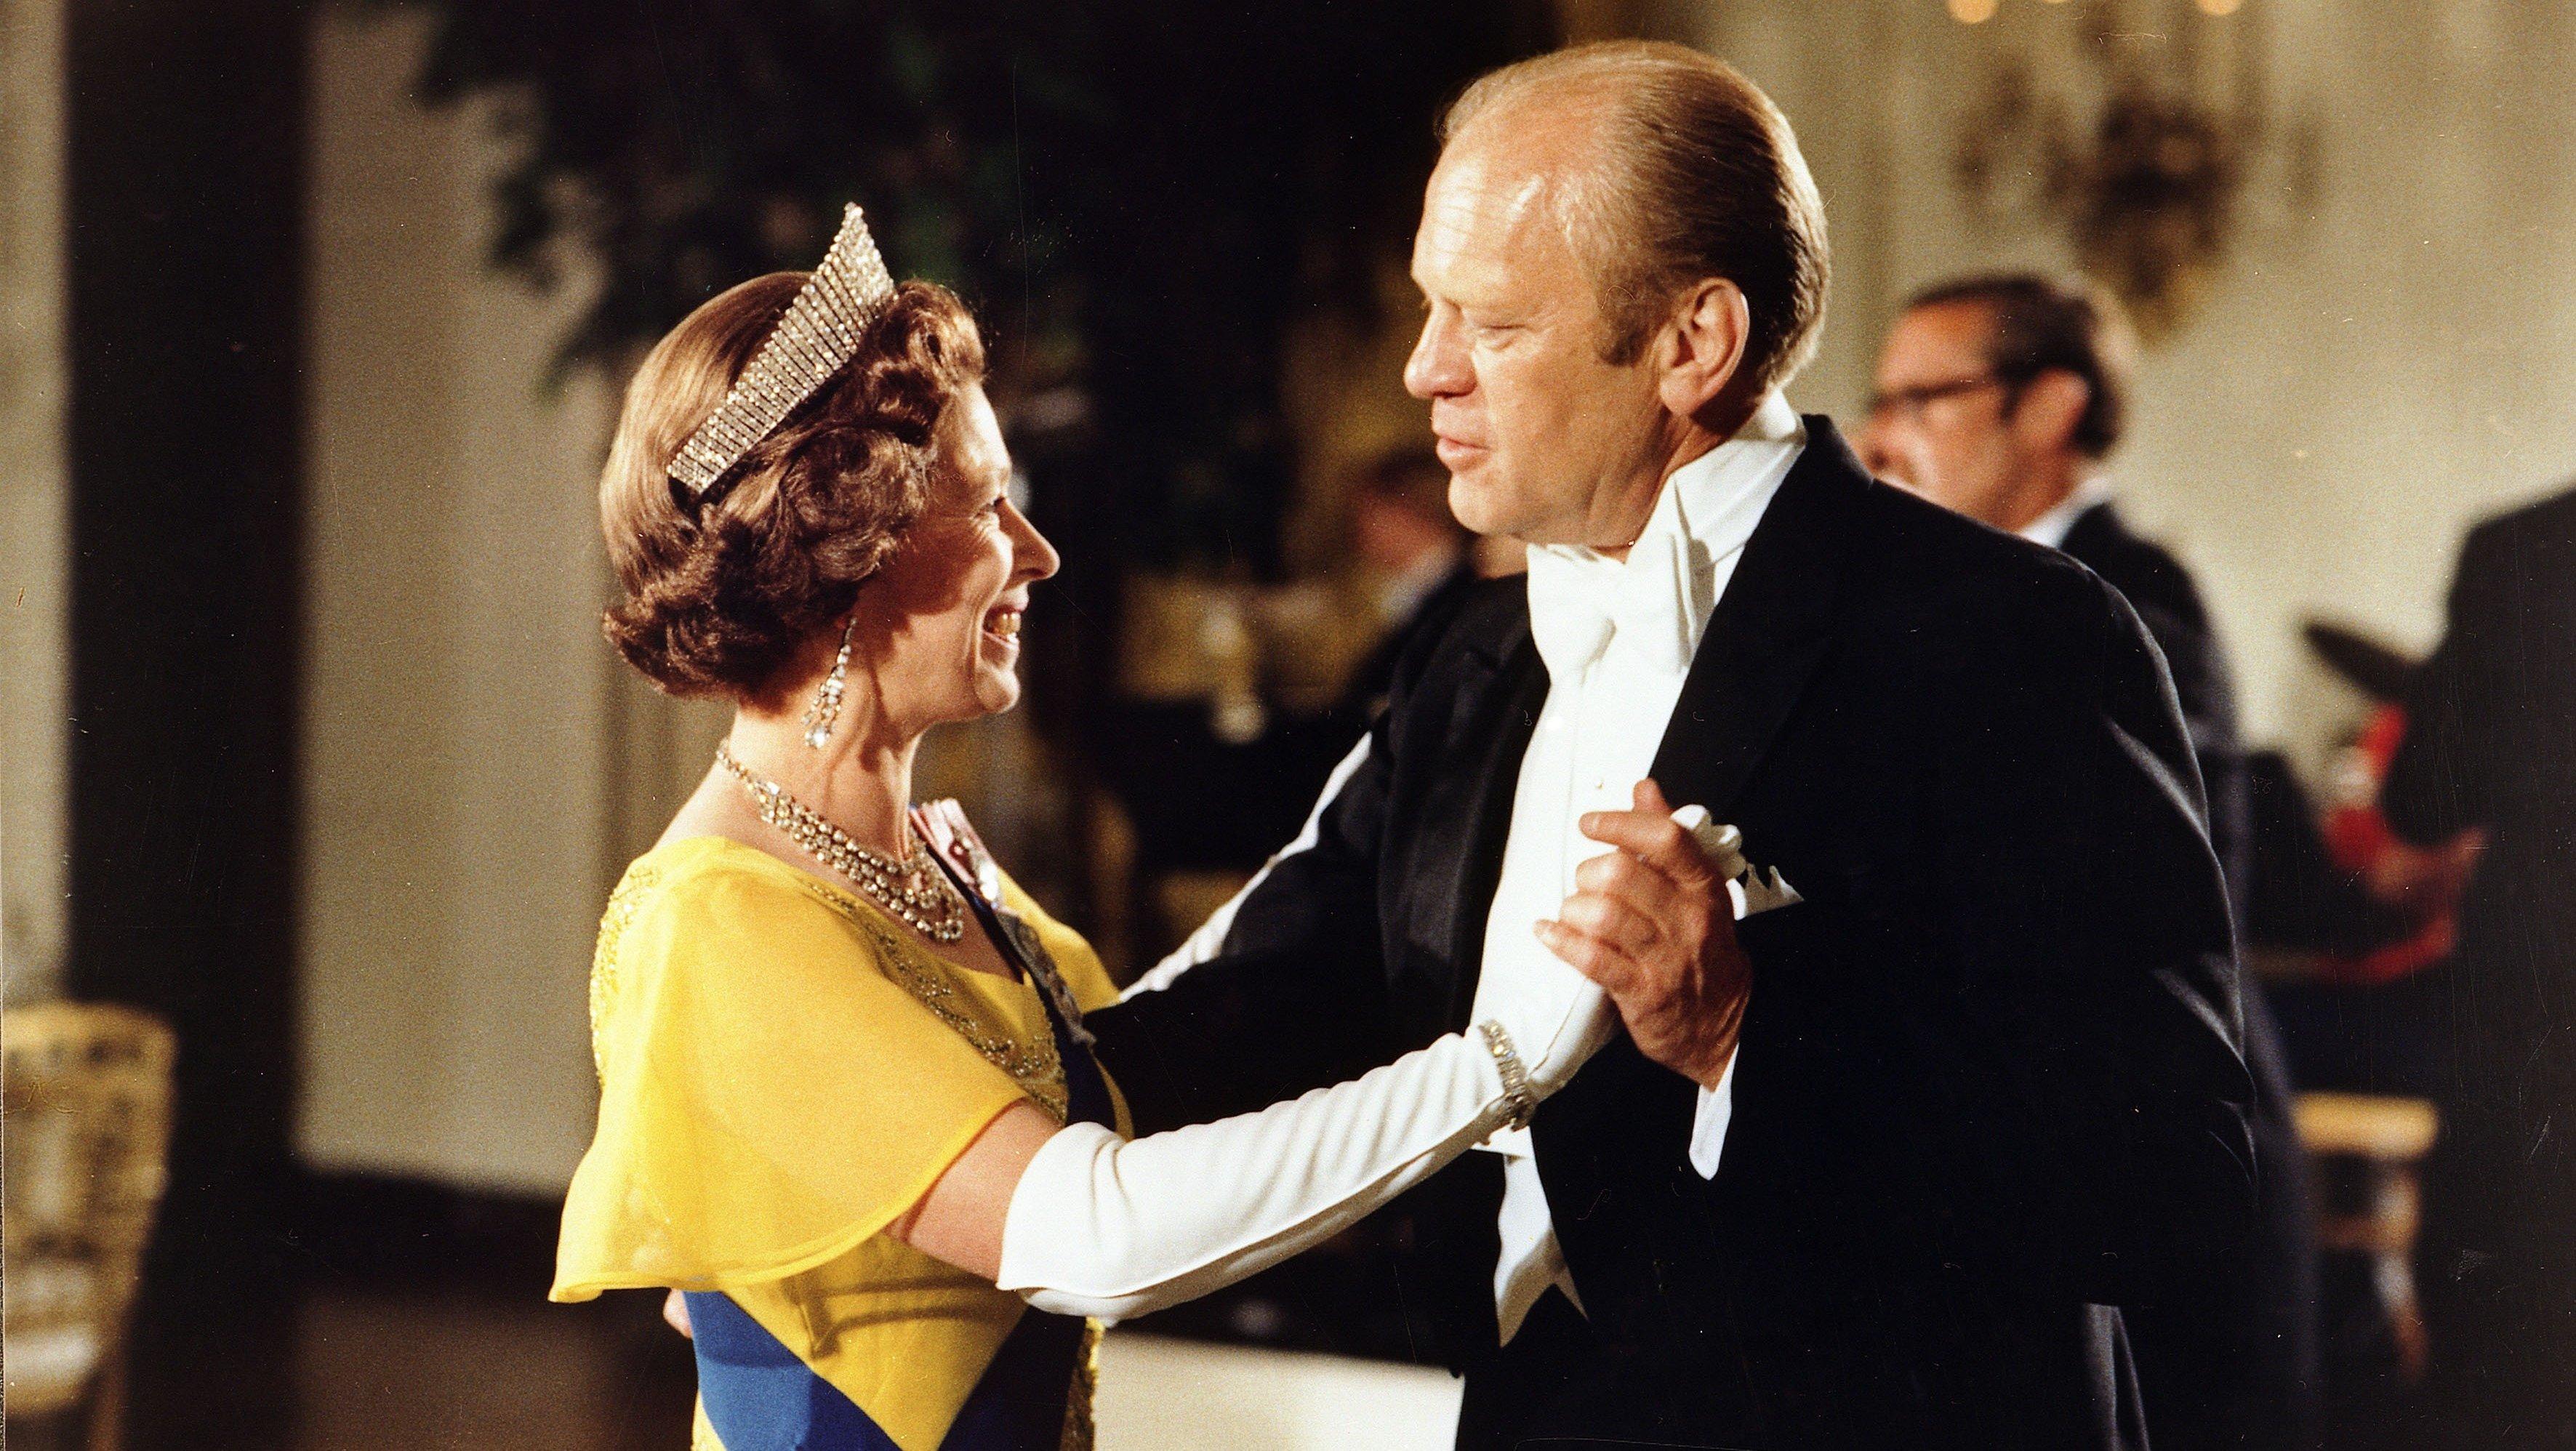 Gerald Ford and Queen Elizabeth II